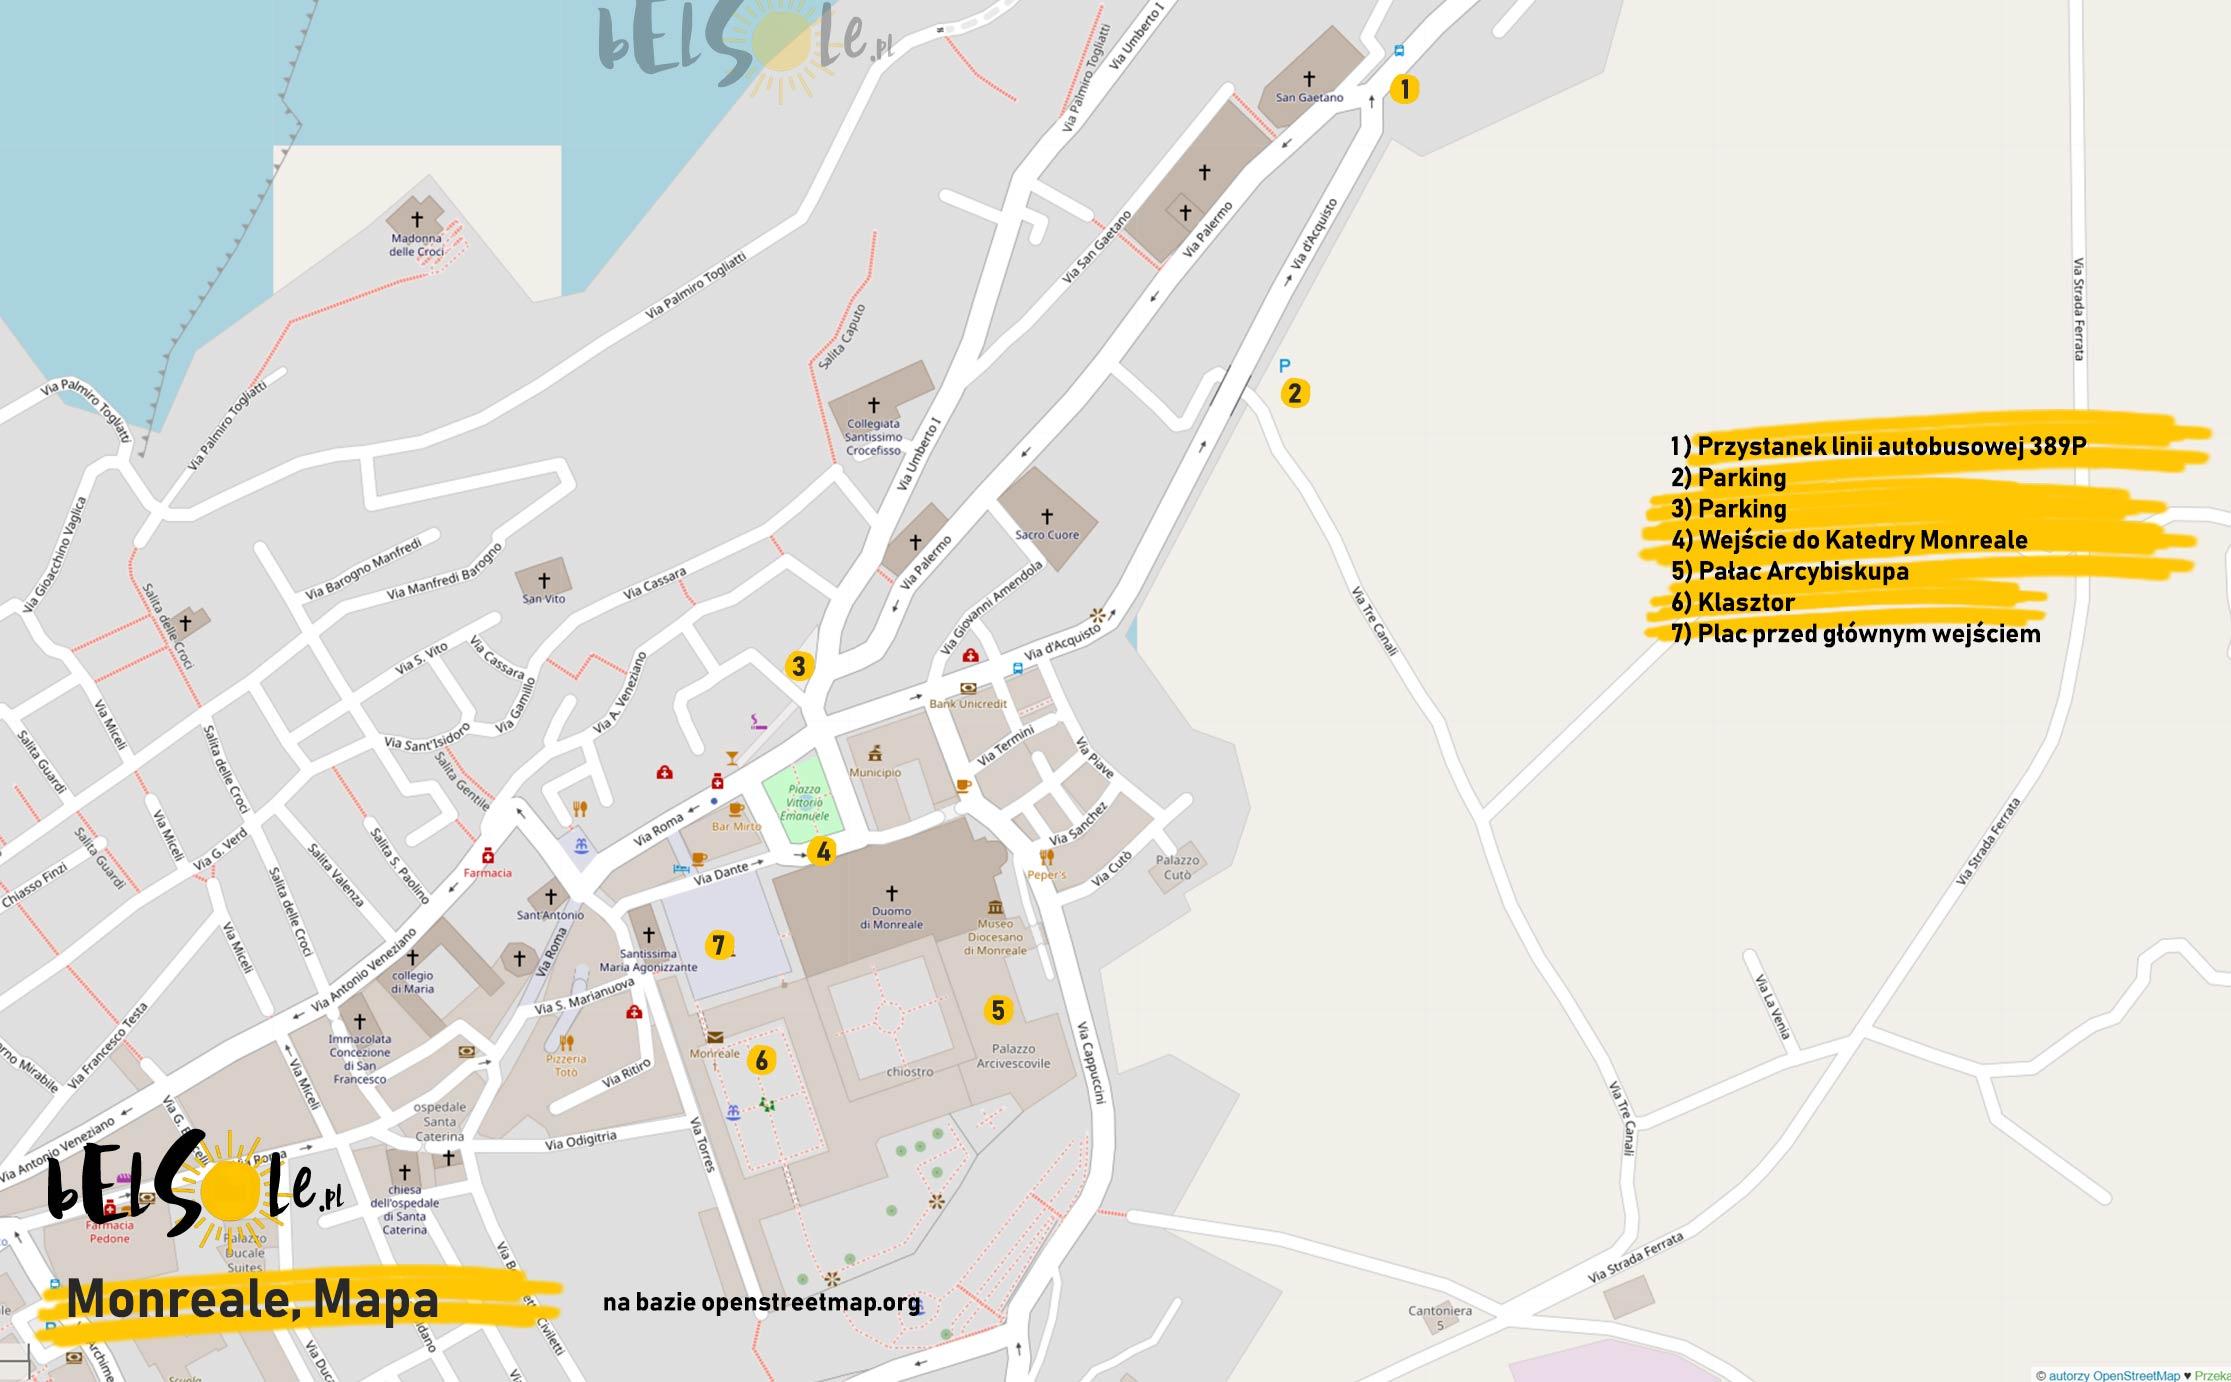 Mapa Monreale, dojazd do katedry